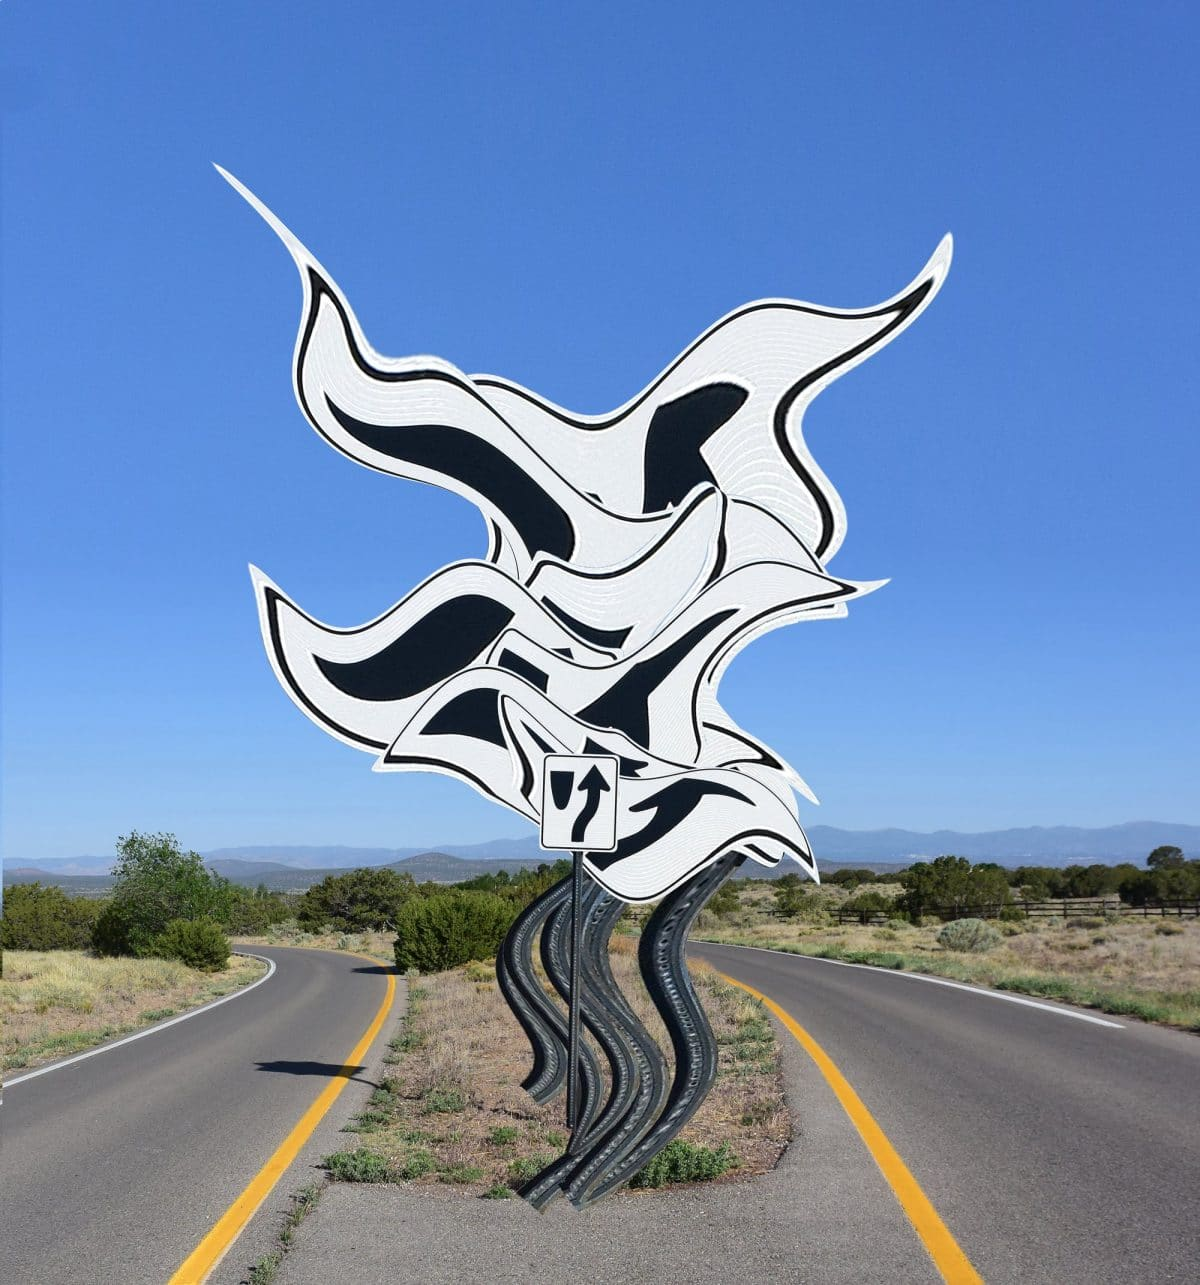 Intersection, Michael Jantzen, Road closed, art, culture, roadsigns